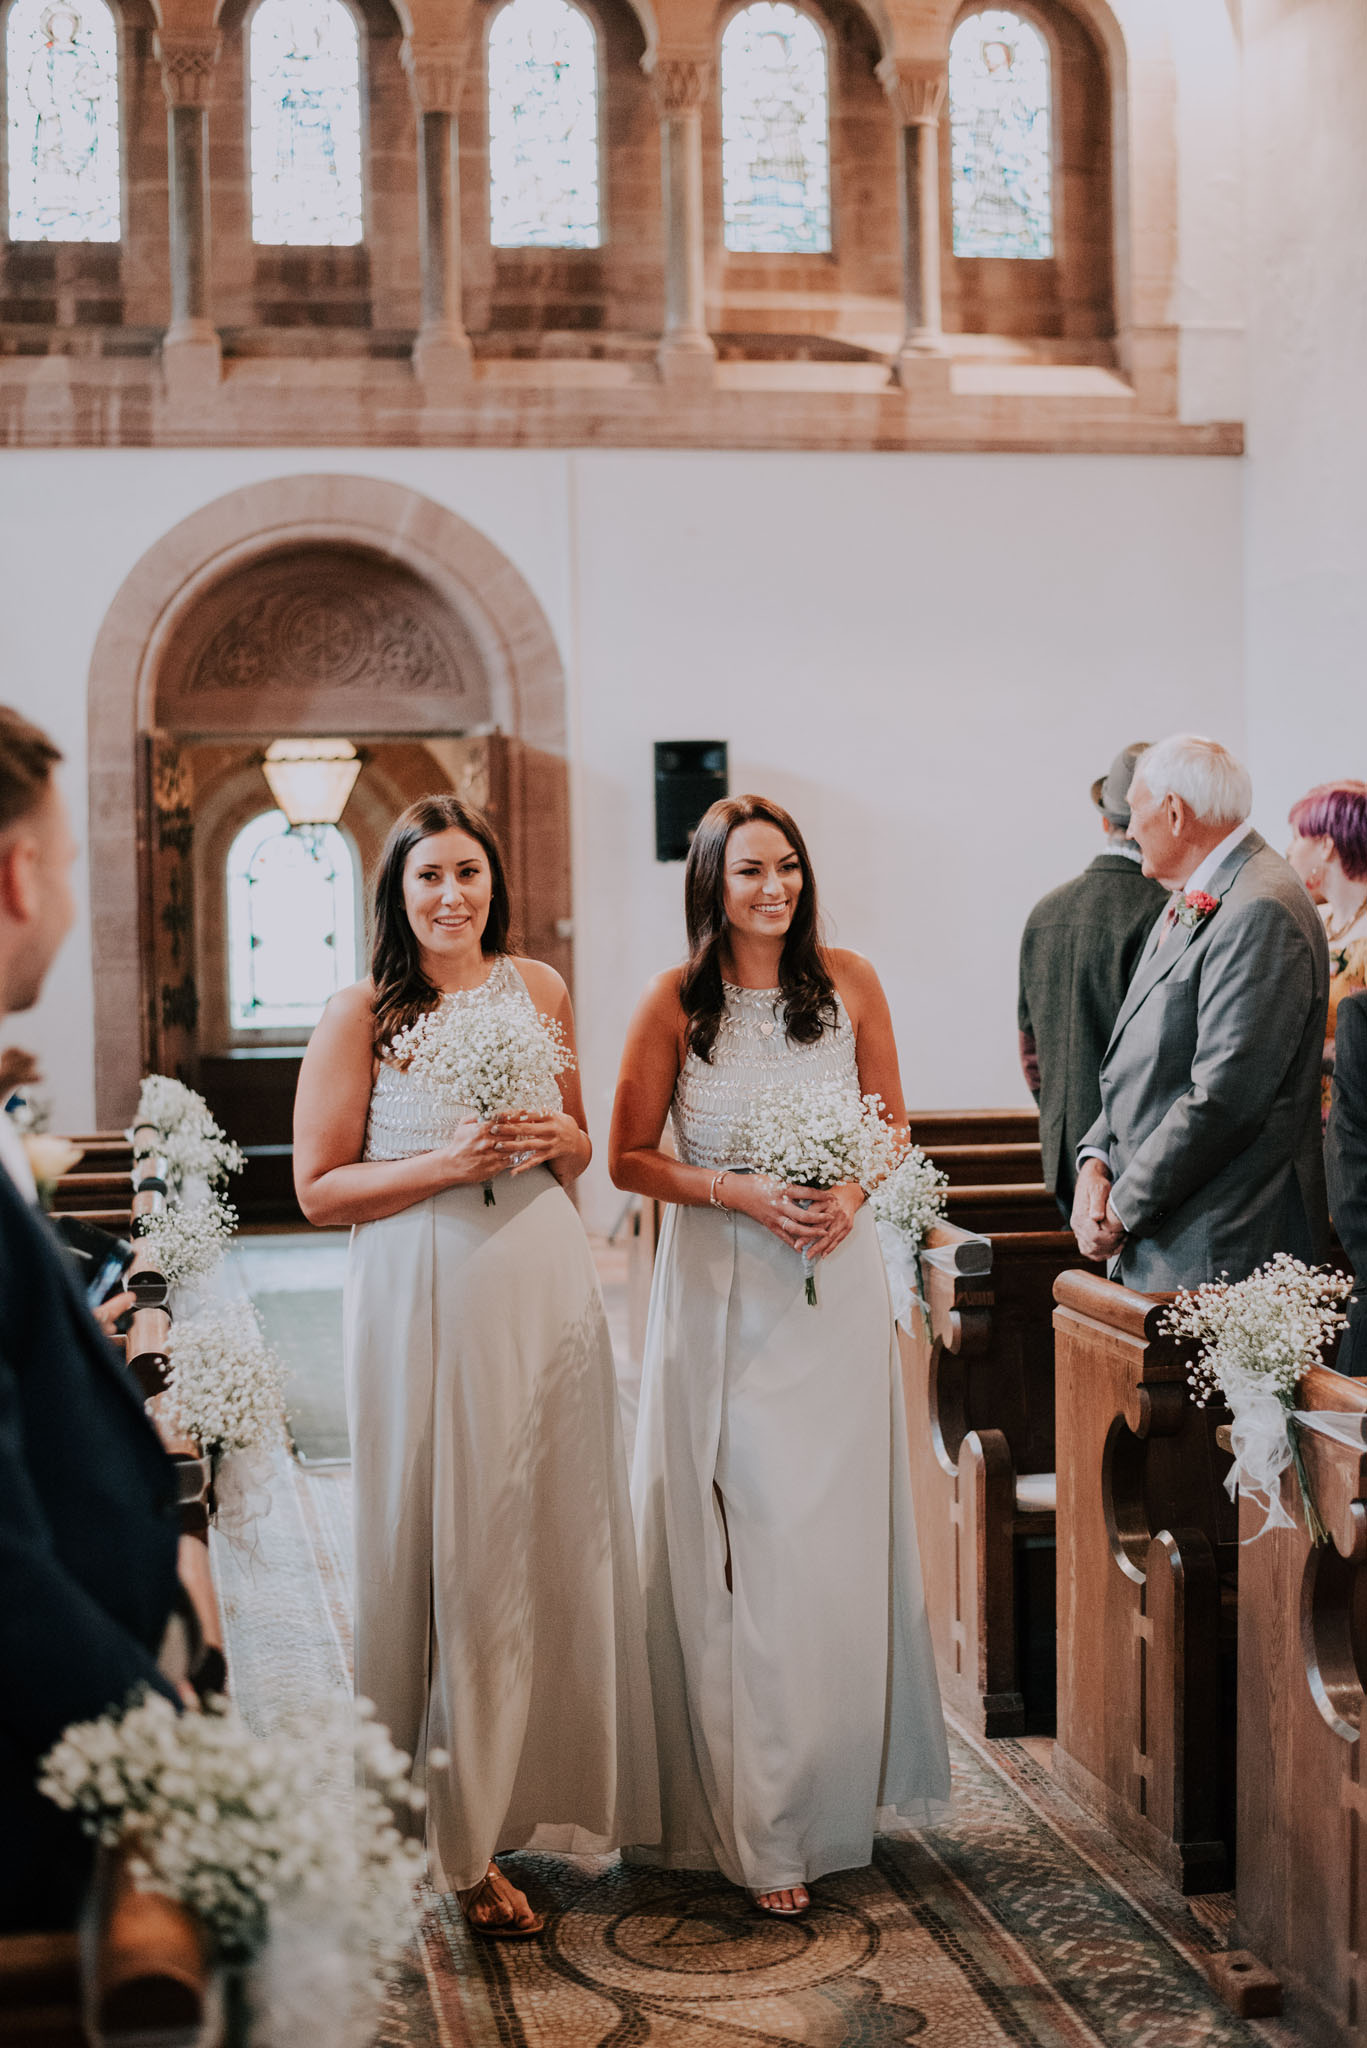 wedding-photographer-glewstone-court-hereford-scott-stockwell-photography160.jpg